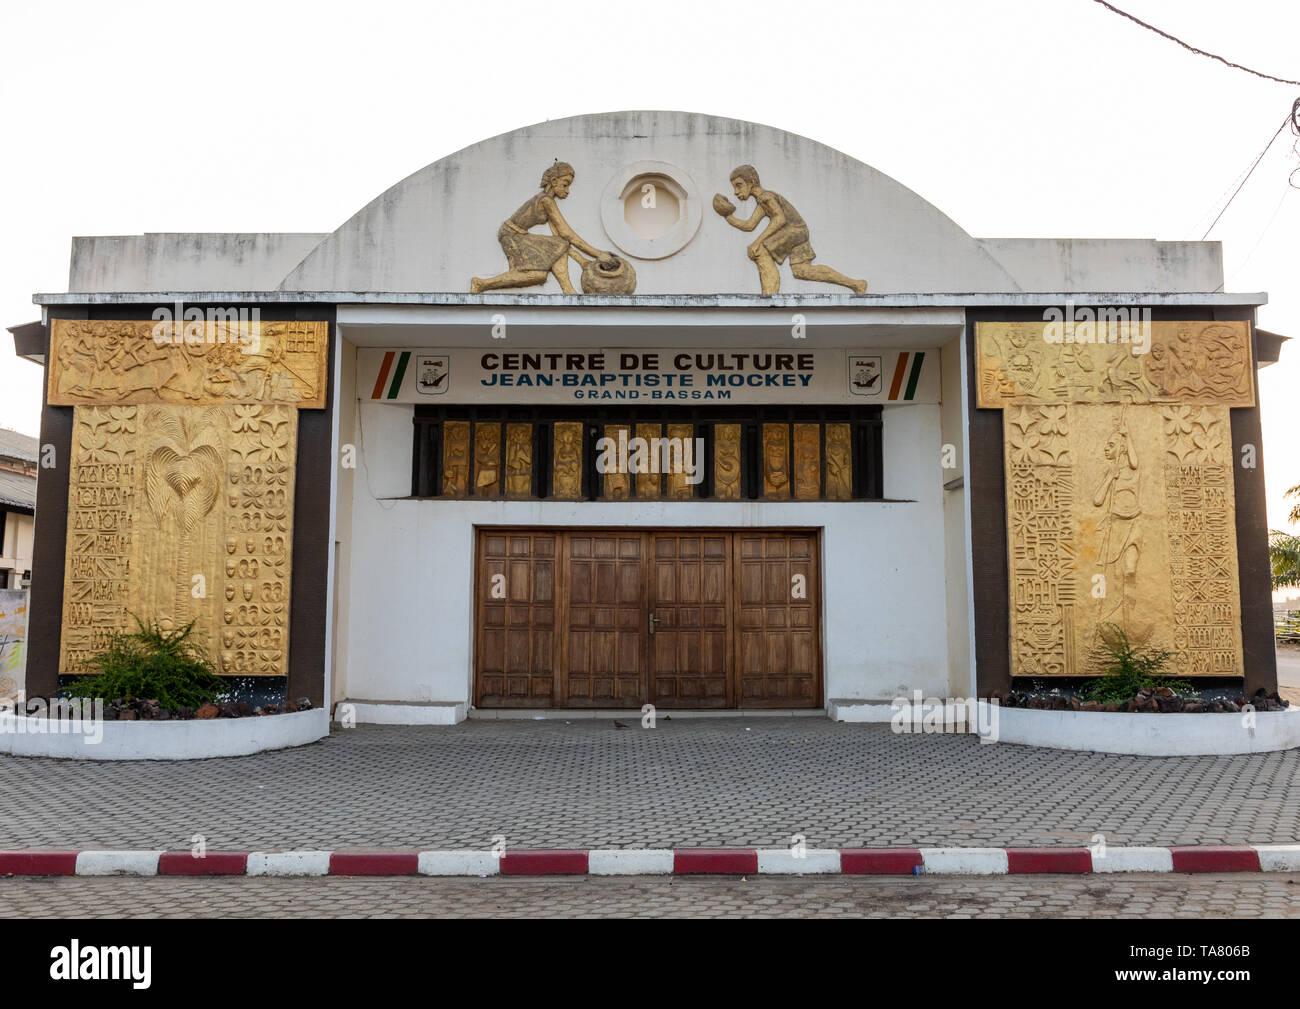 Centre culturel Jean-Baptiste Mockey formerly the vegetable market, Sud-Comoé, Grand-Bassam, Ivory Coast - Stock Image